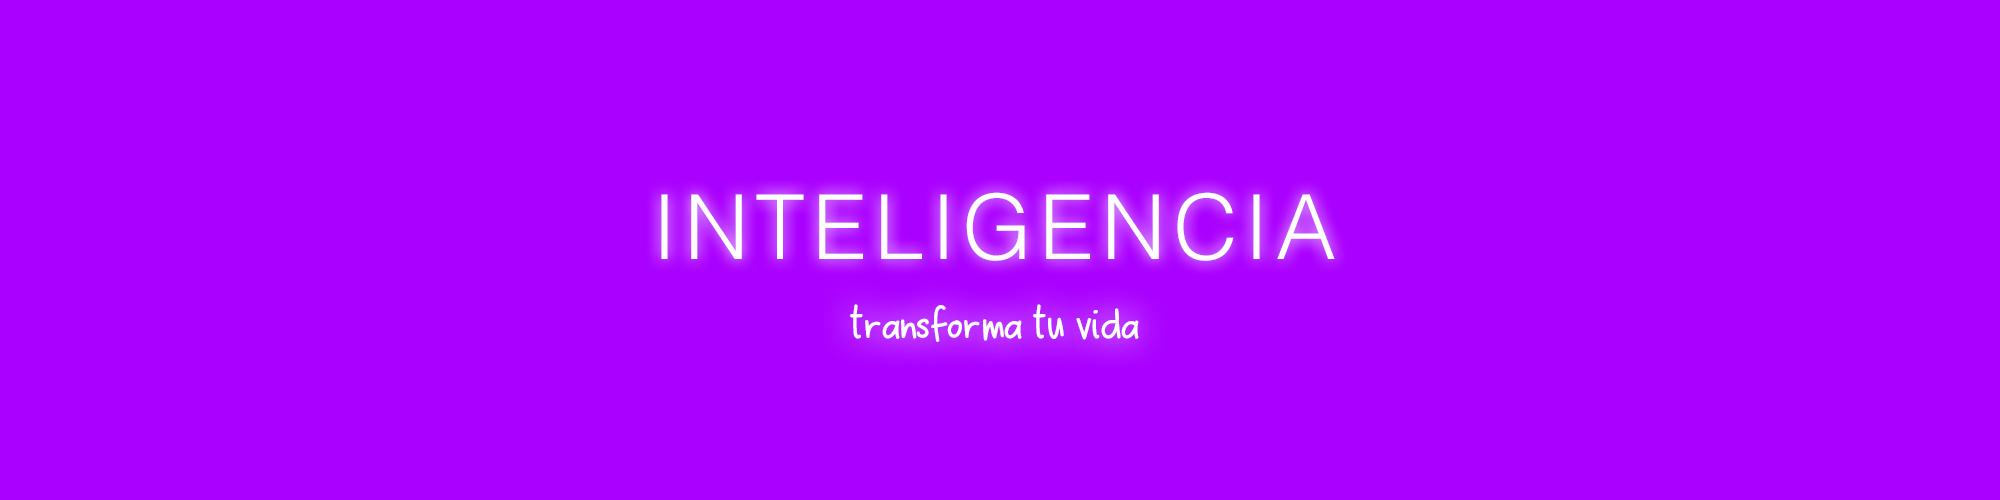 2-inteligencia-1